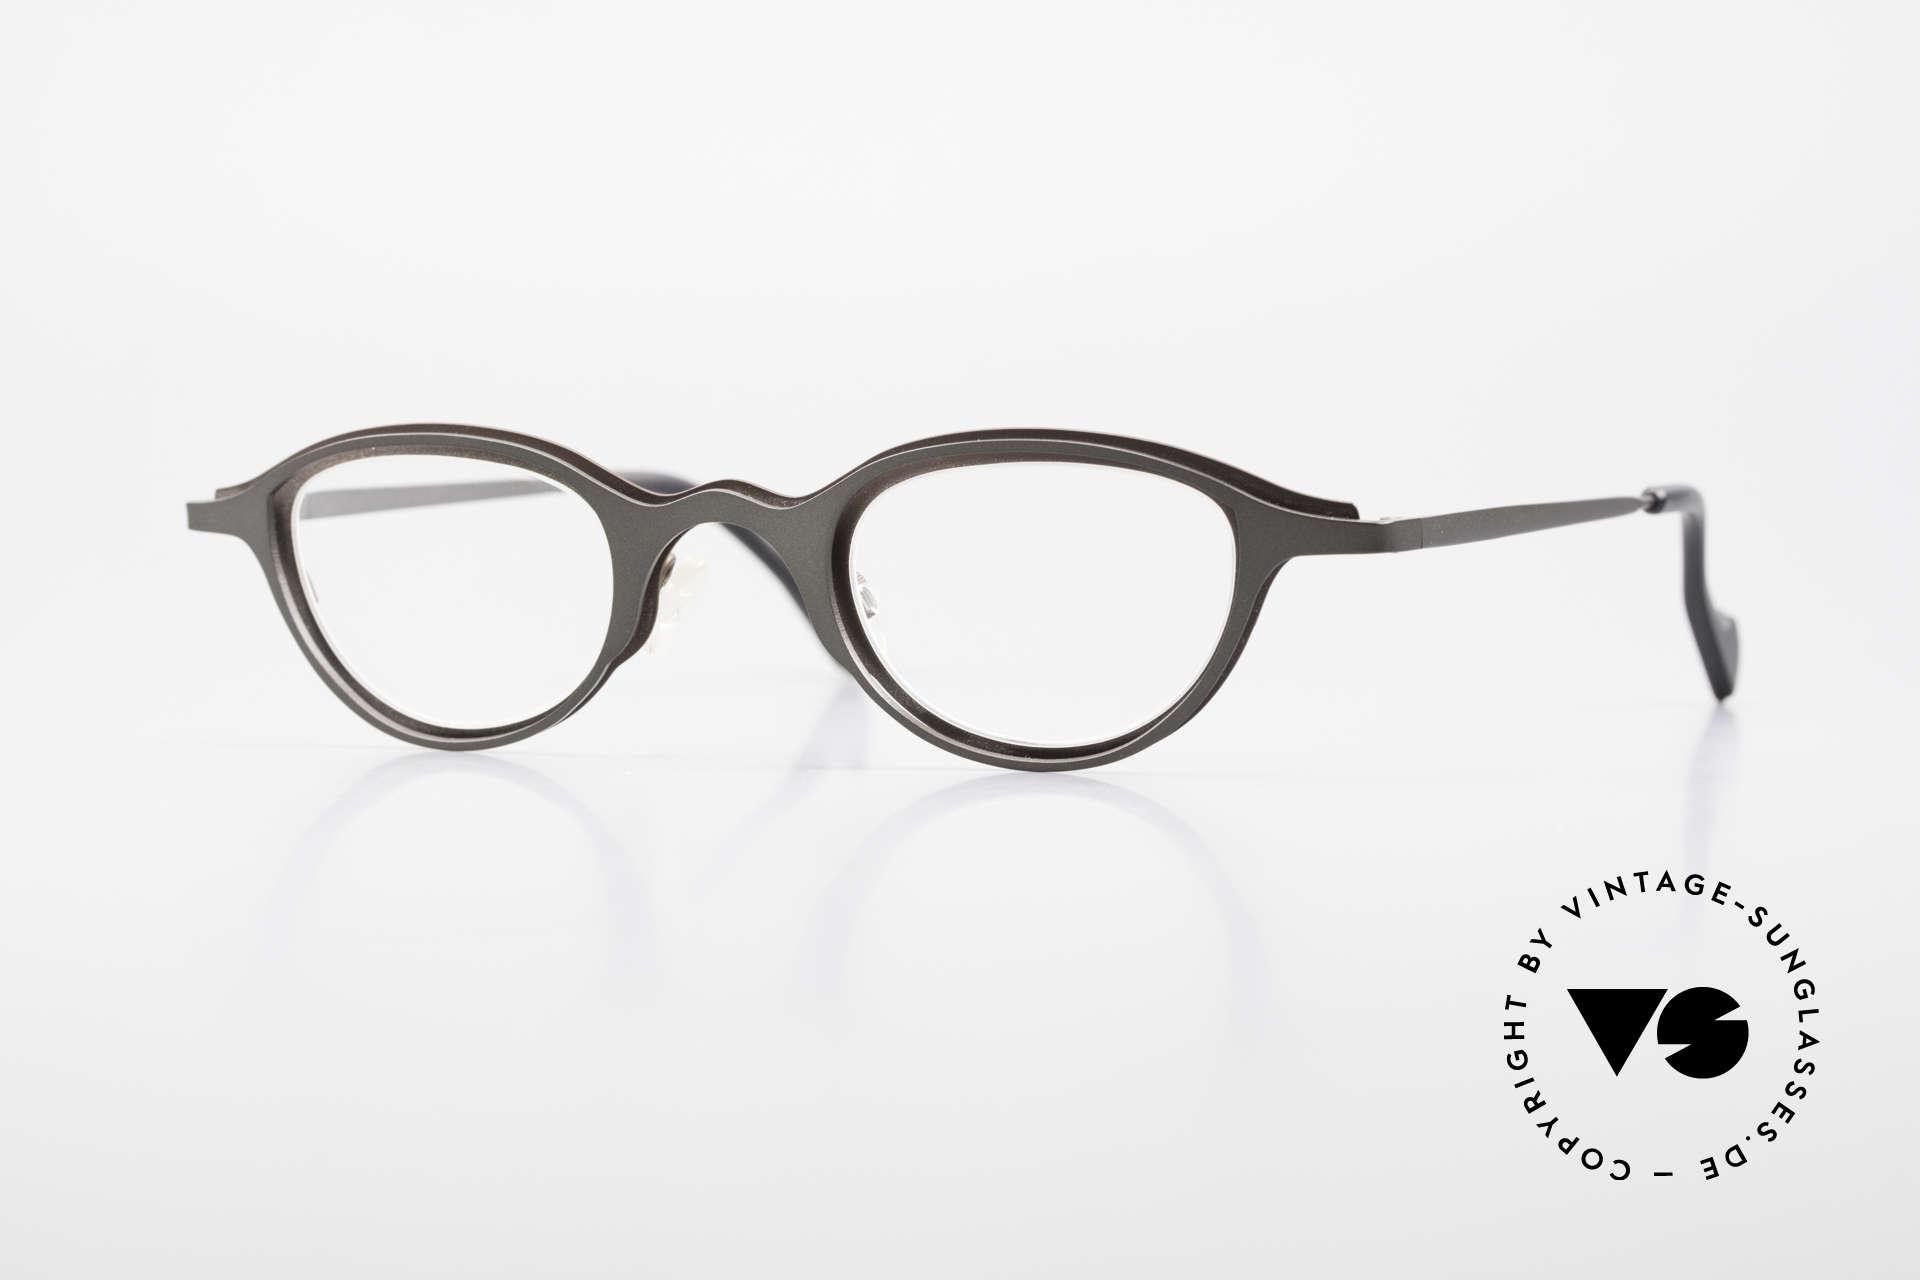 Theo Belgium Uno Enchanting Ladies Eyeglasses, very interesting 90's Theo Belgium ladies eyeglasses, Made for Women